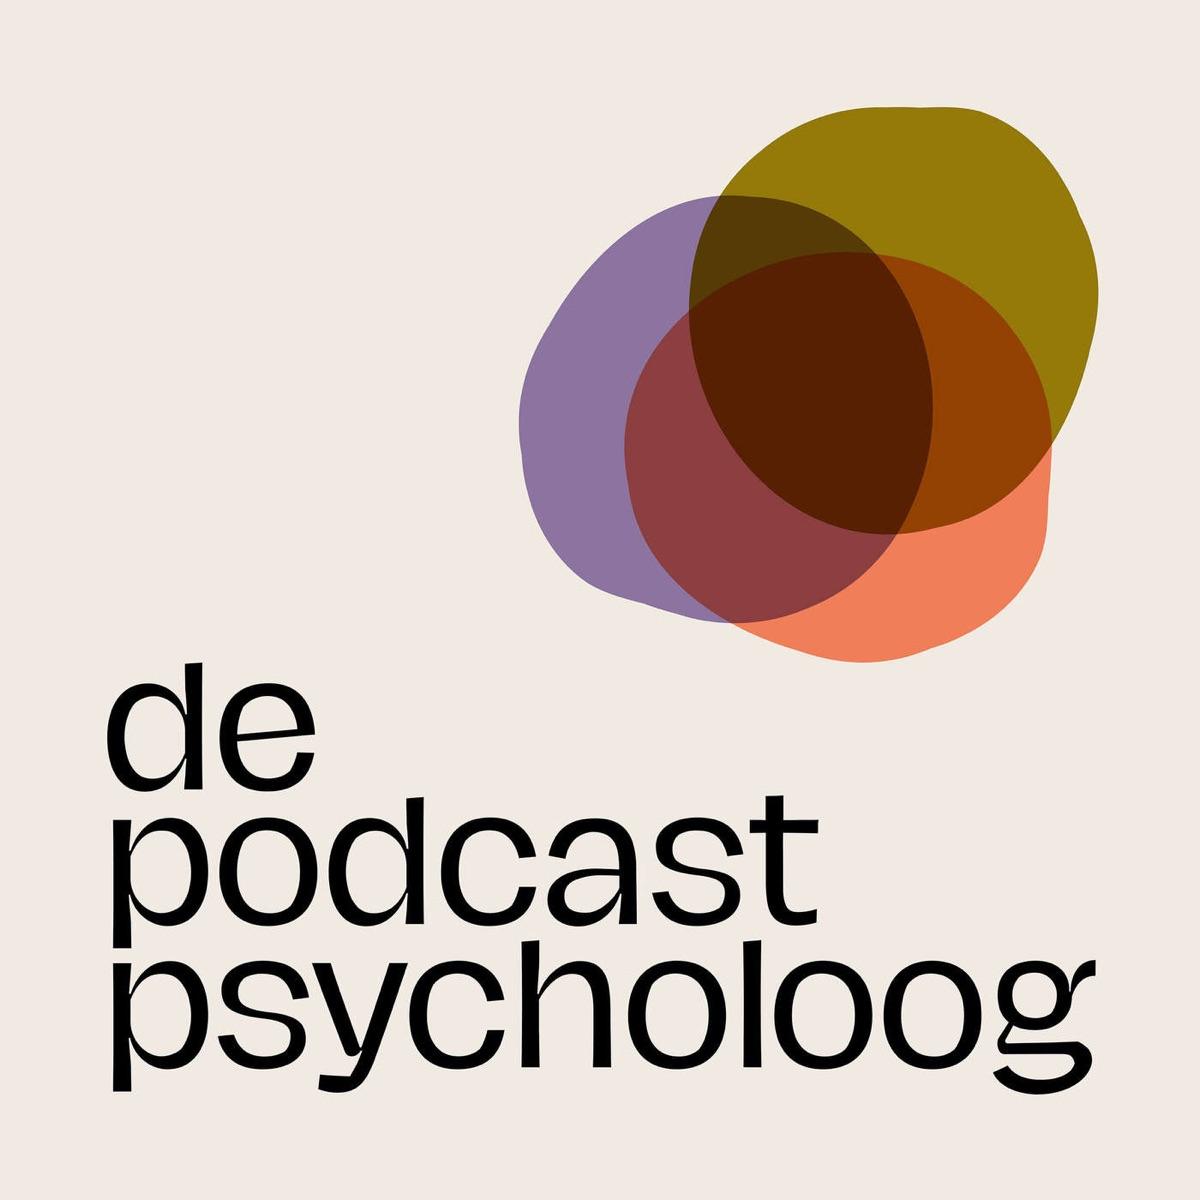 De Podcast Psycholoog